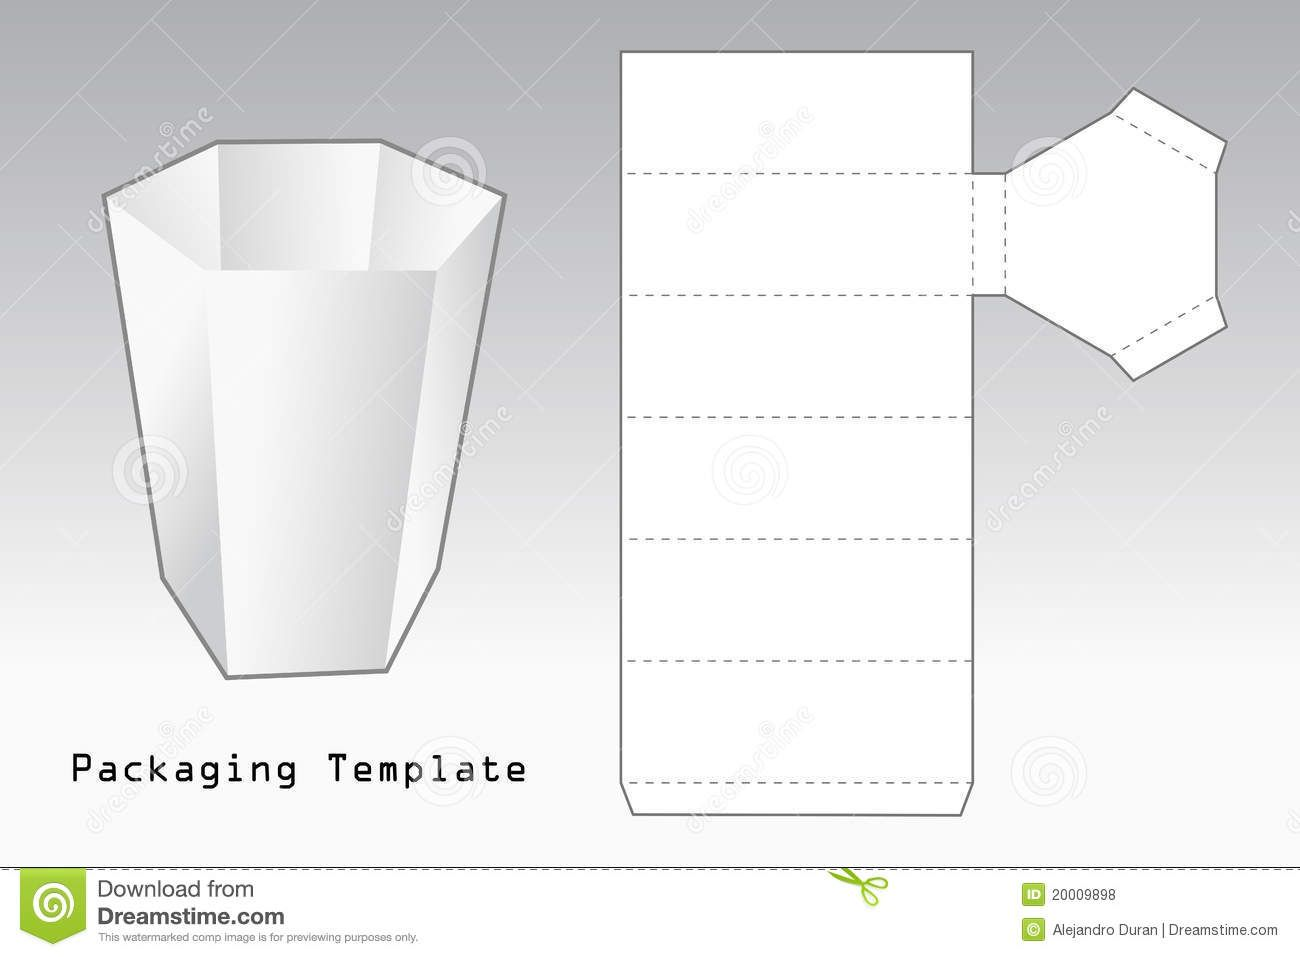 packaging template